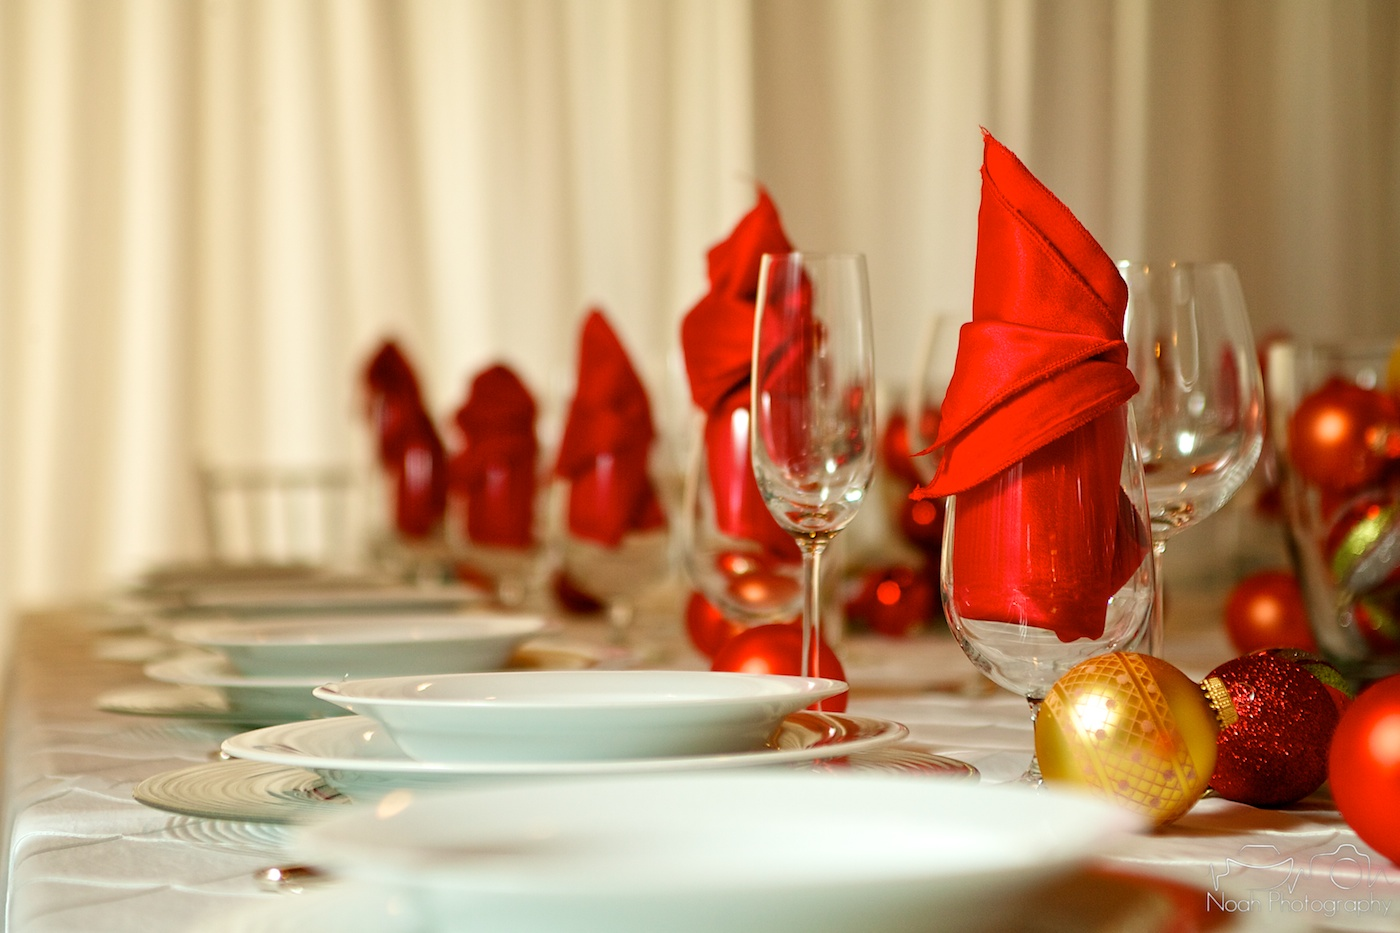 Christmas wedding | The Merry Bride